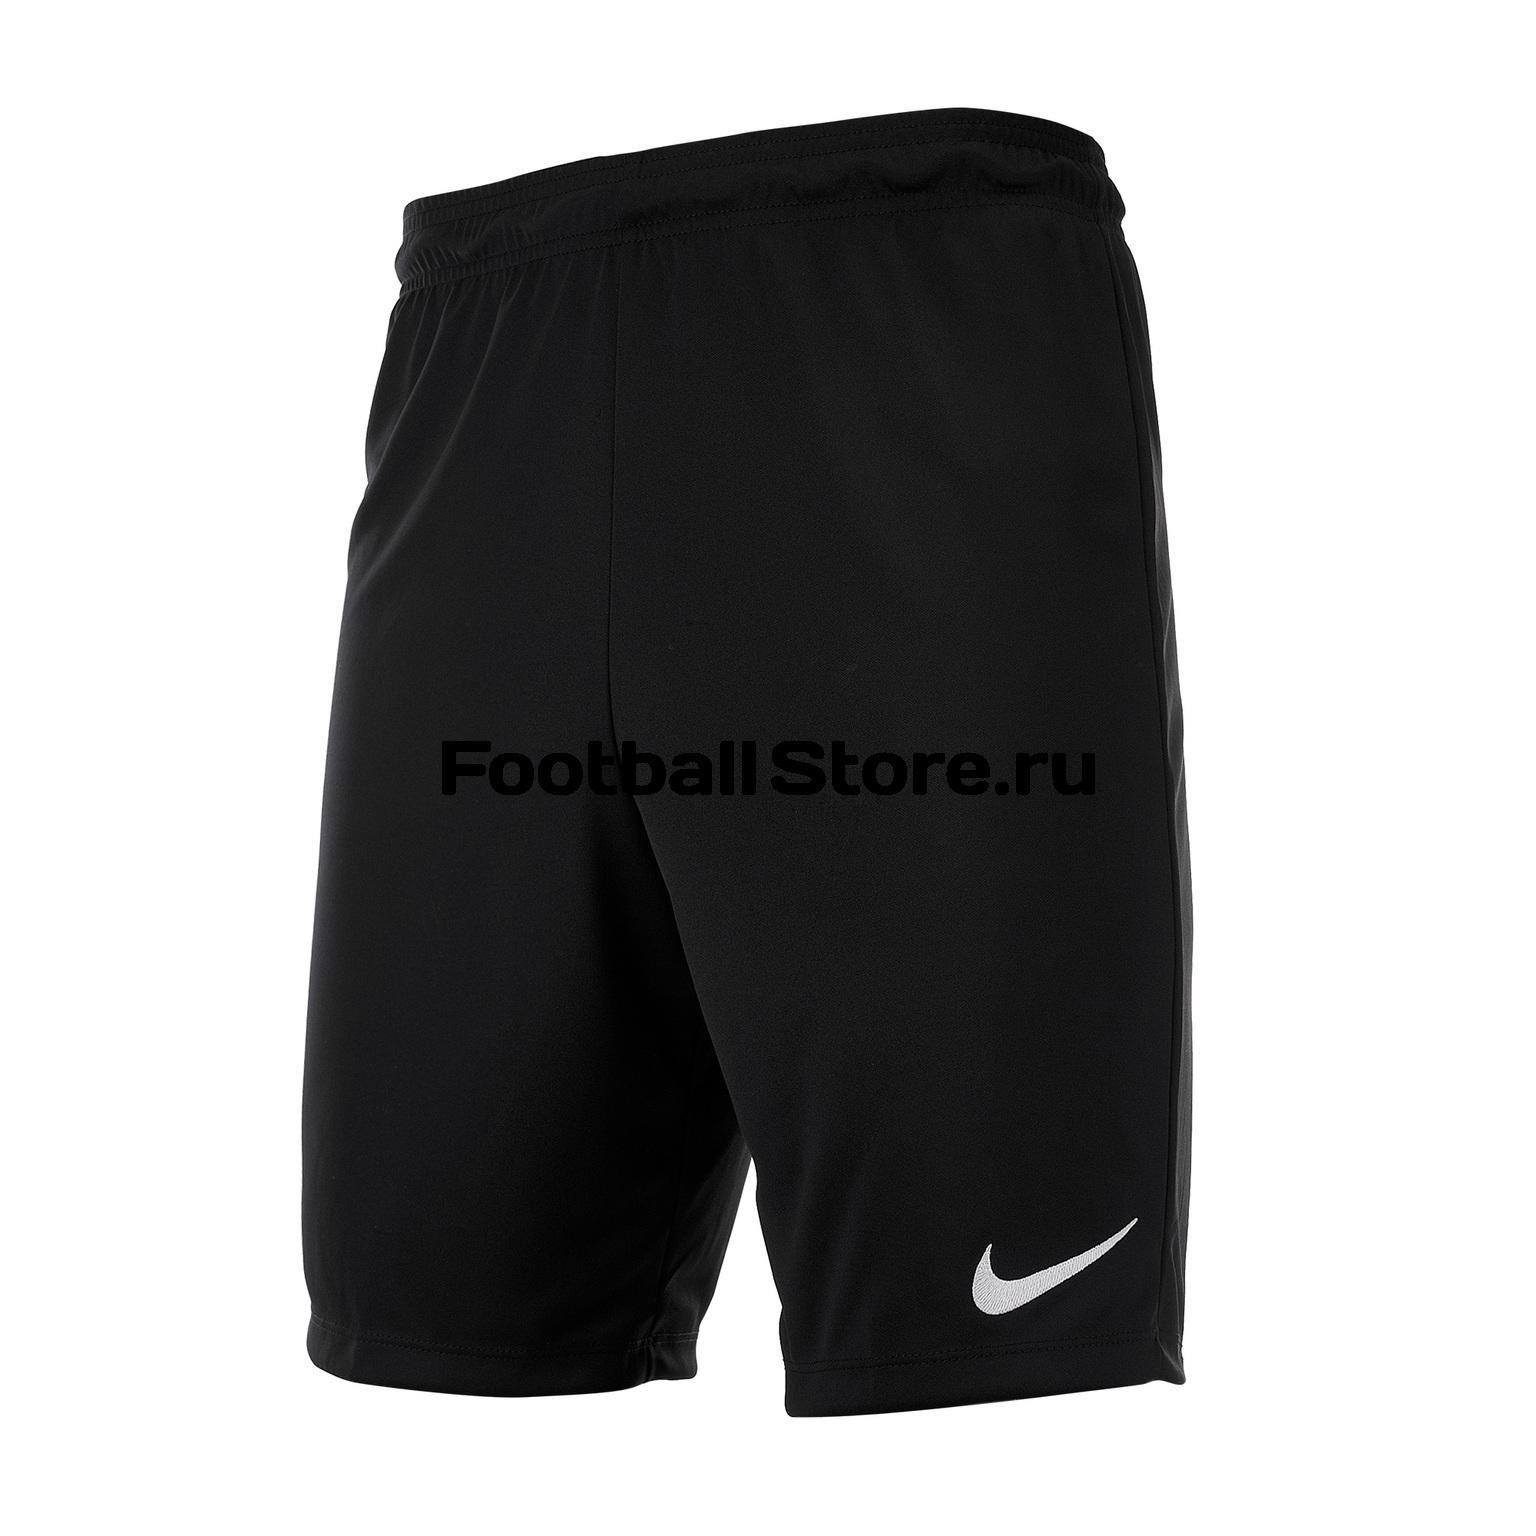 0cd92dae Шорты Nike Park II KNIT Short NB 725887-010 – купить в интернет магазине  footballstore, цена, фото